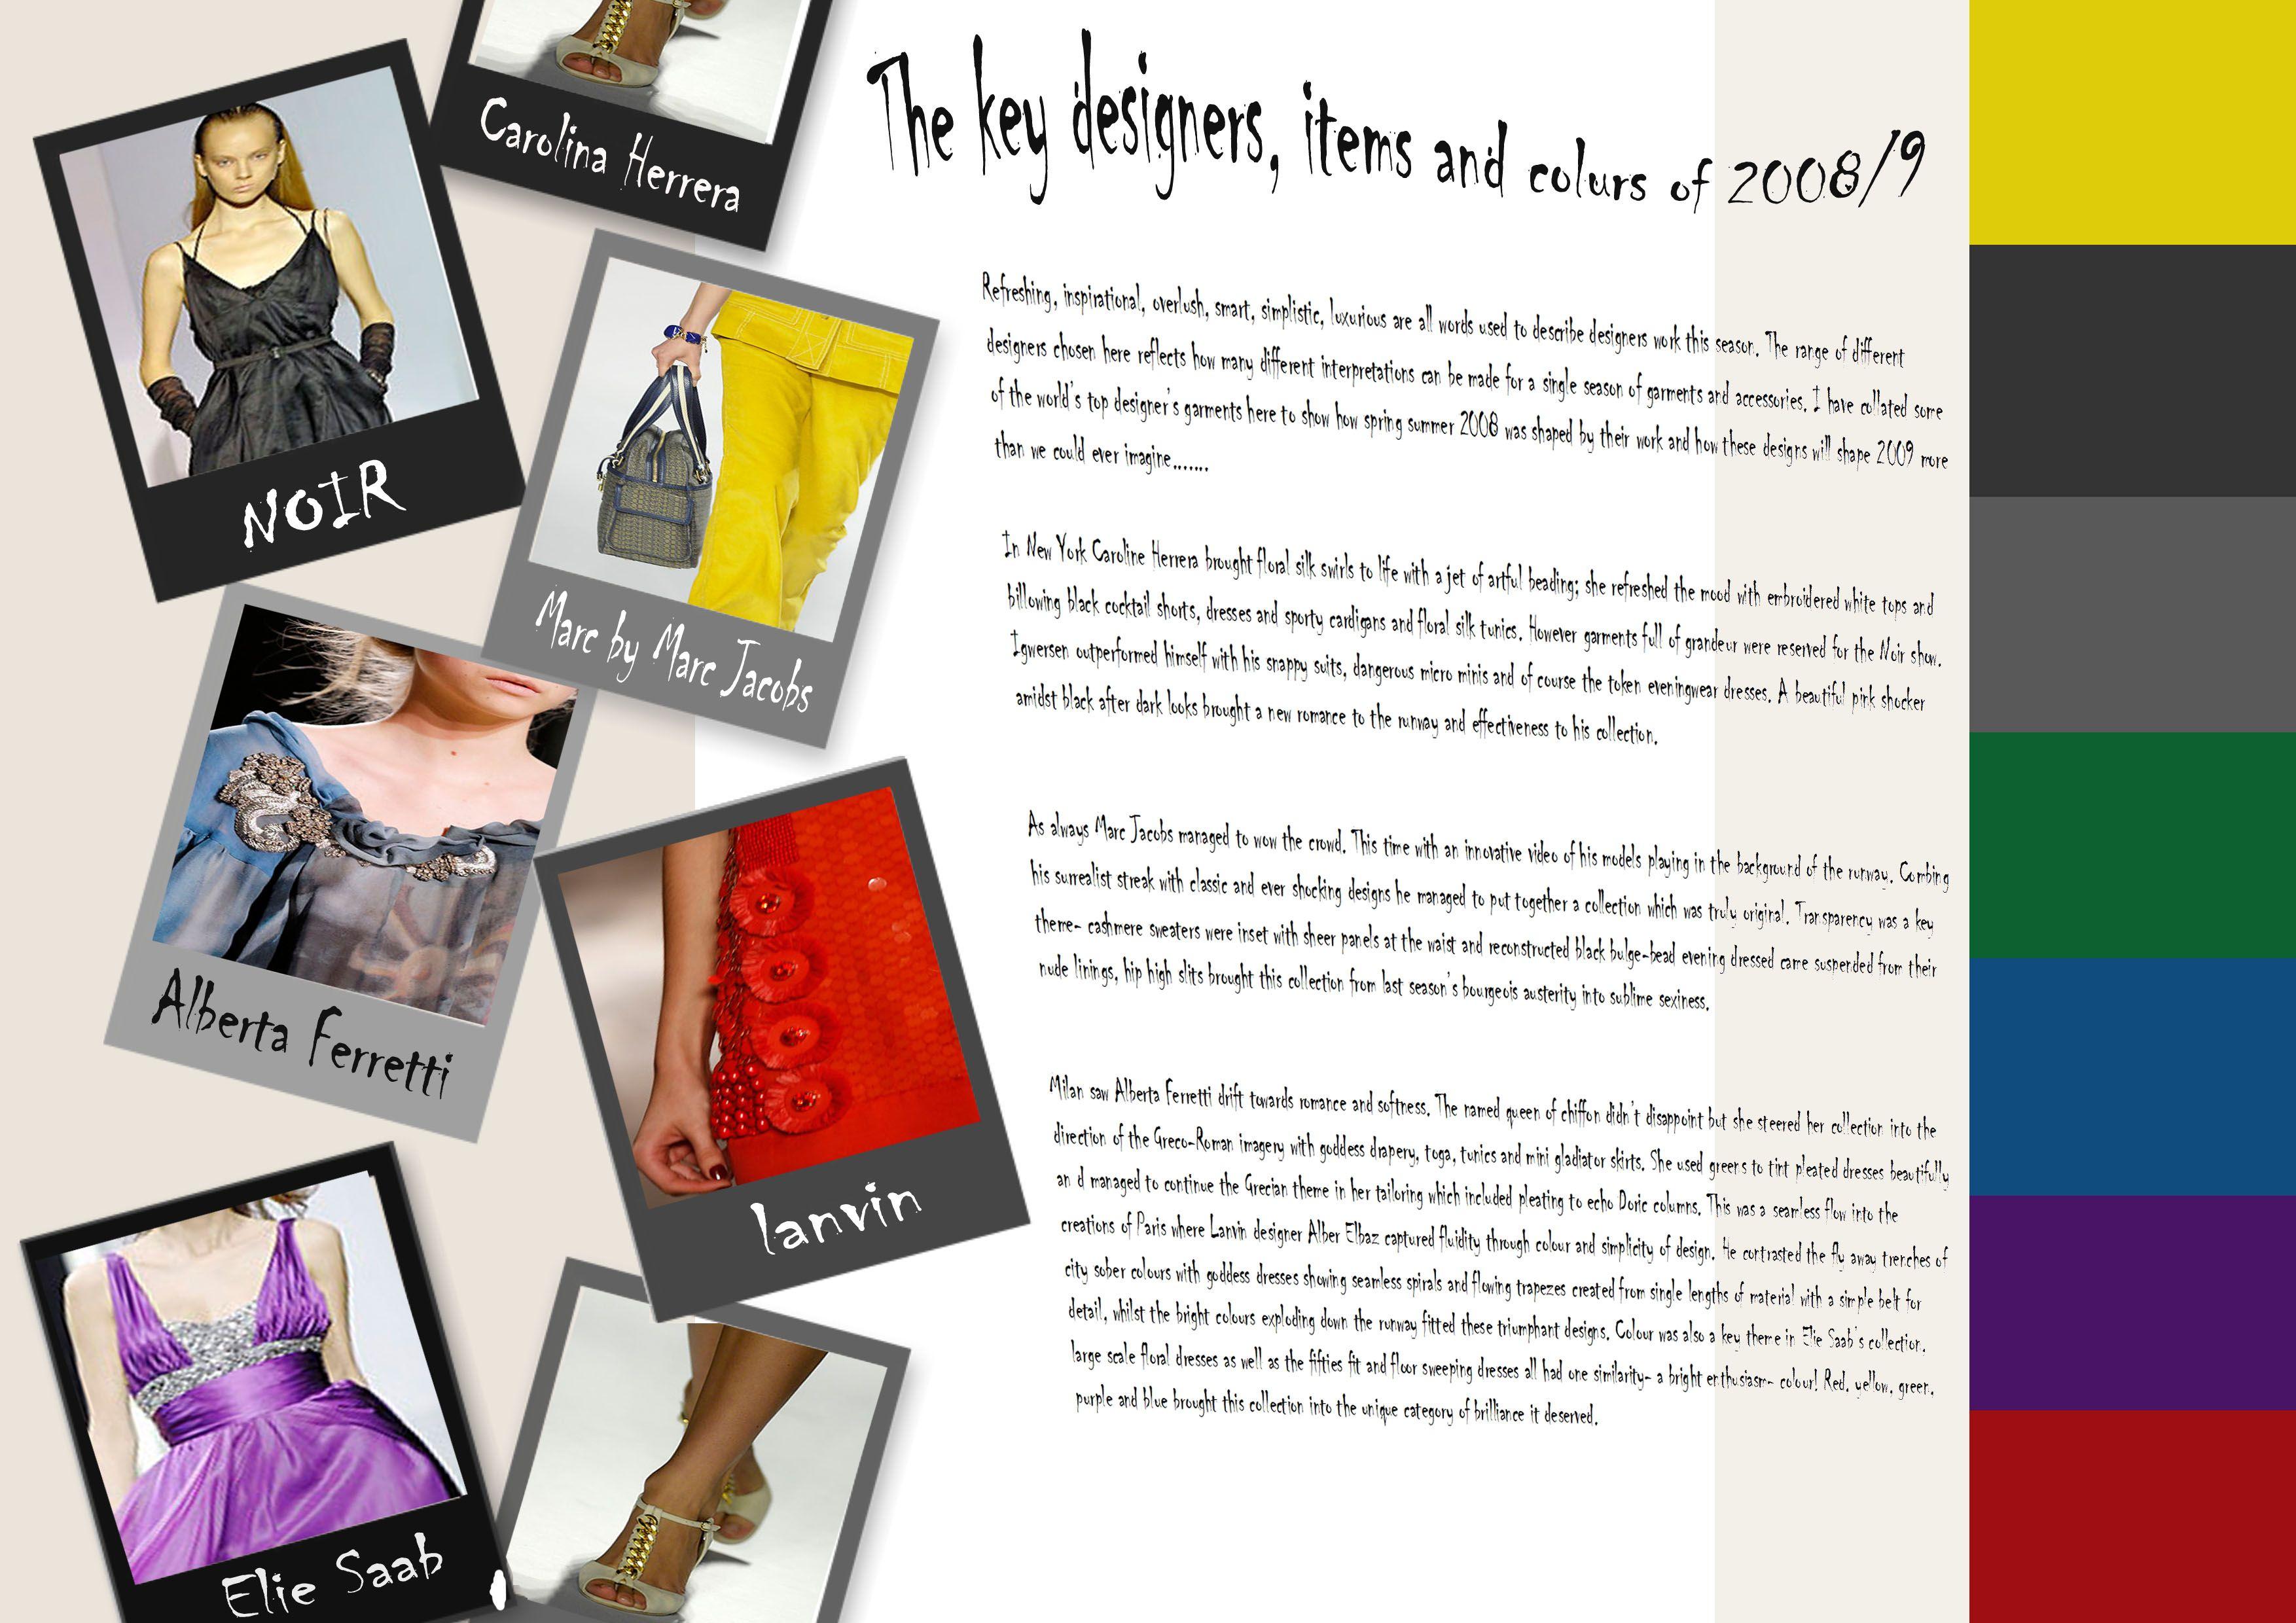 17 Best images about Magazine Layout on Pinterest   Layout design ...